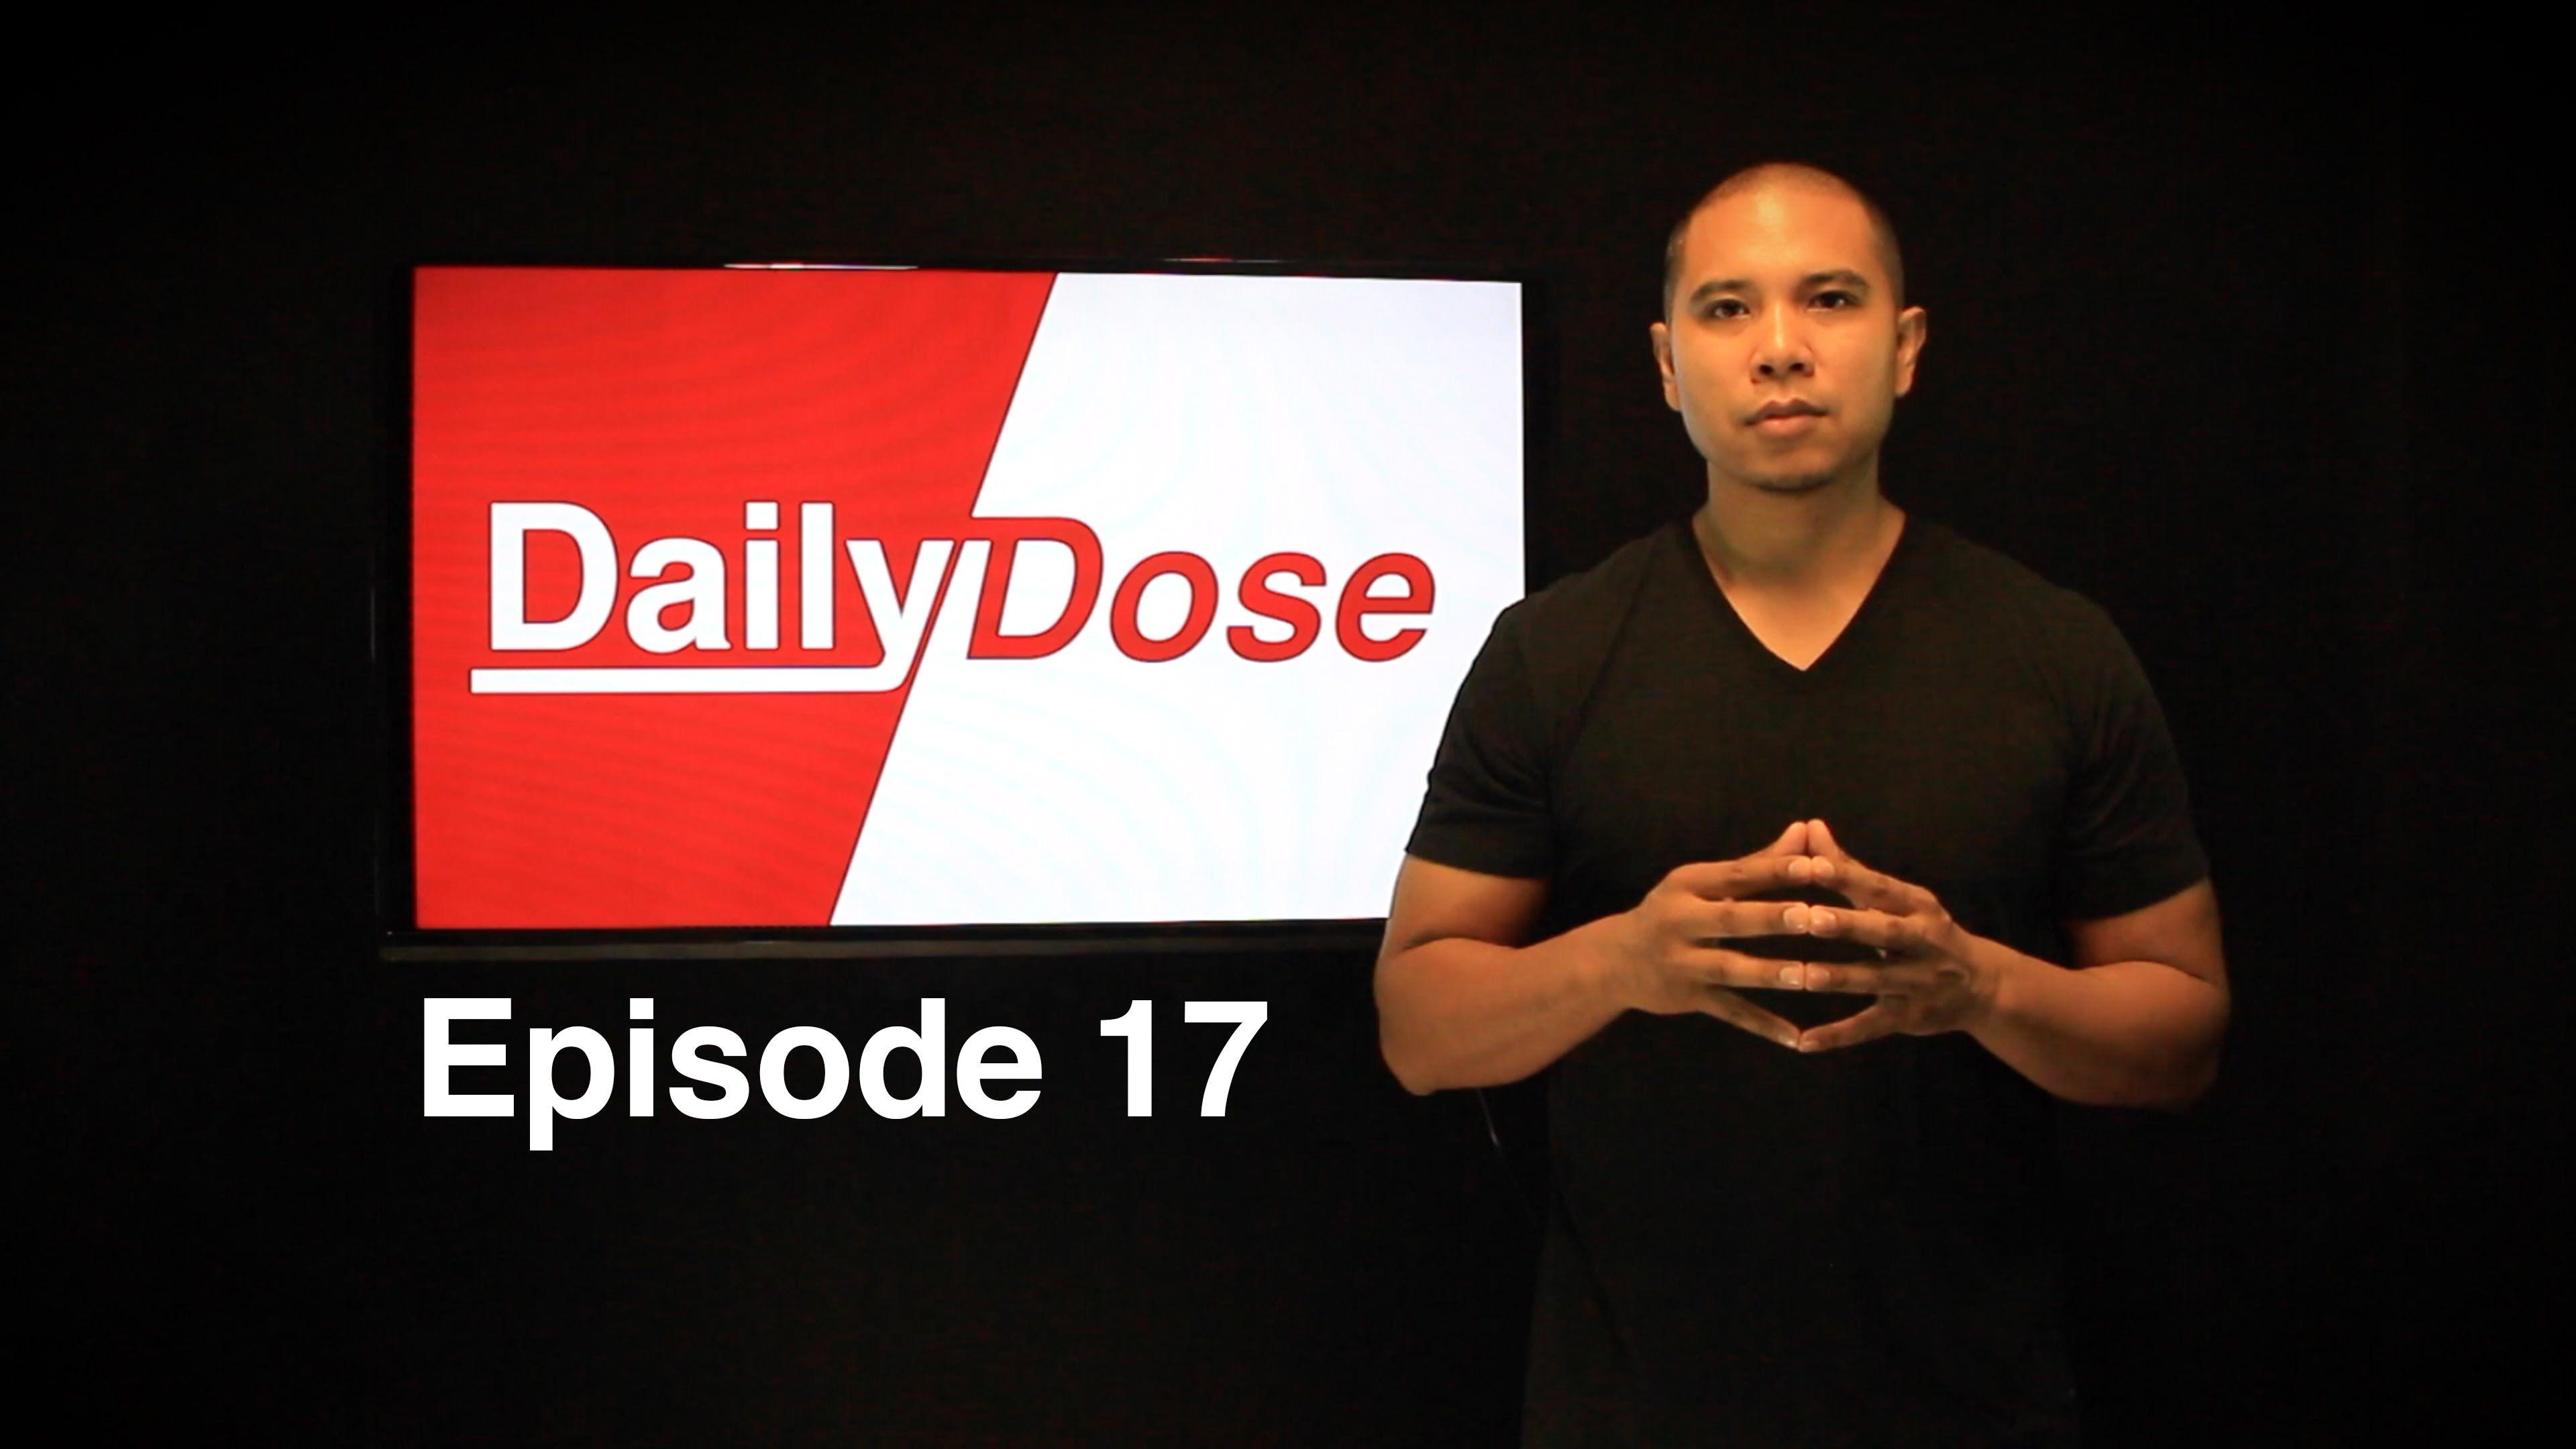 Daily Dose Ep 17 - A Fall of heavyweights, Floyd Mayweather asks Freddie Roach to train McGregor